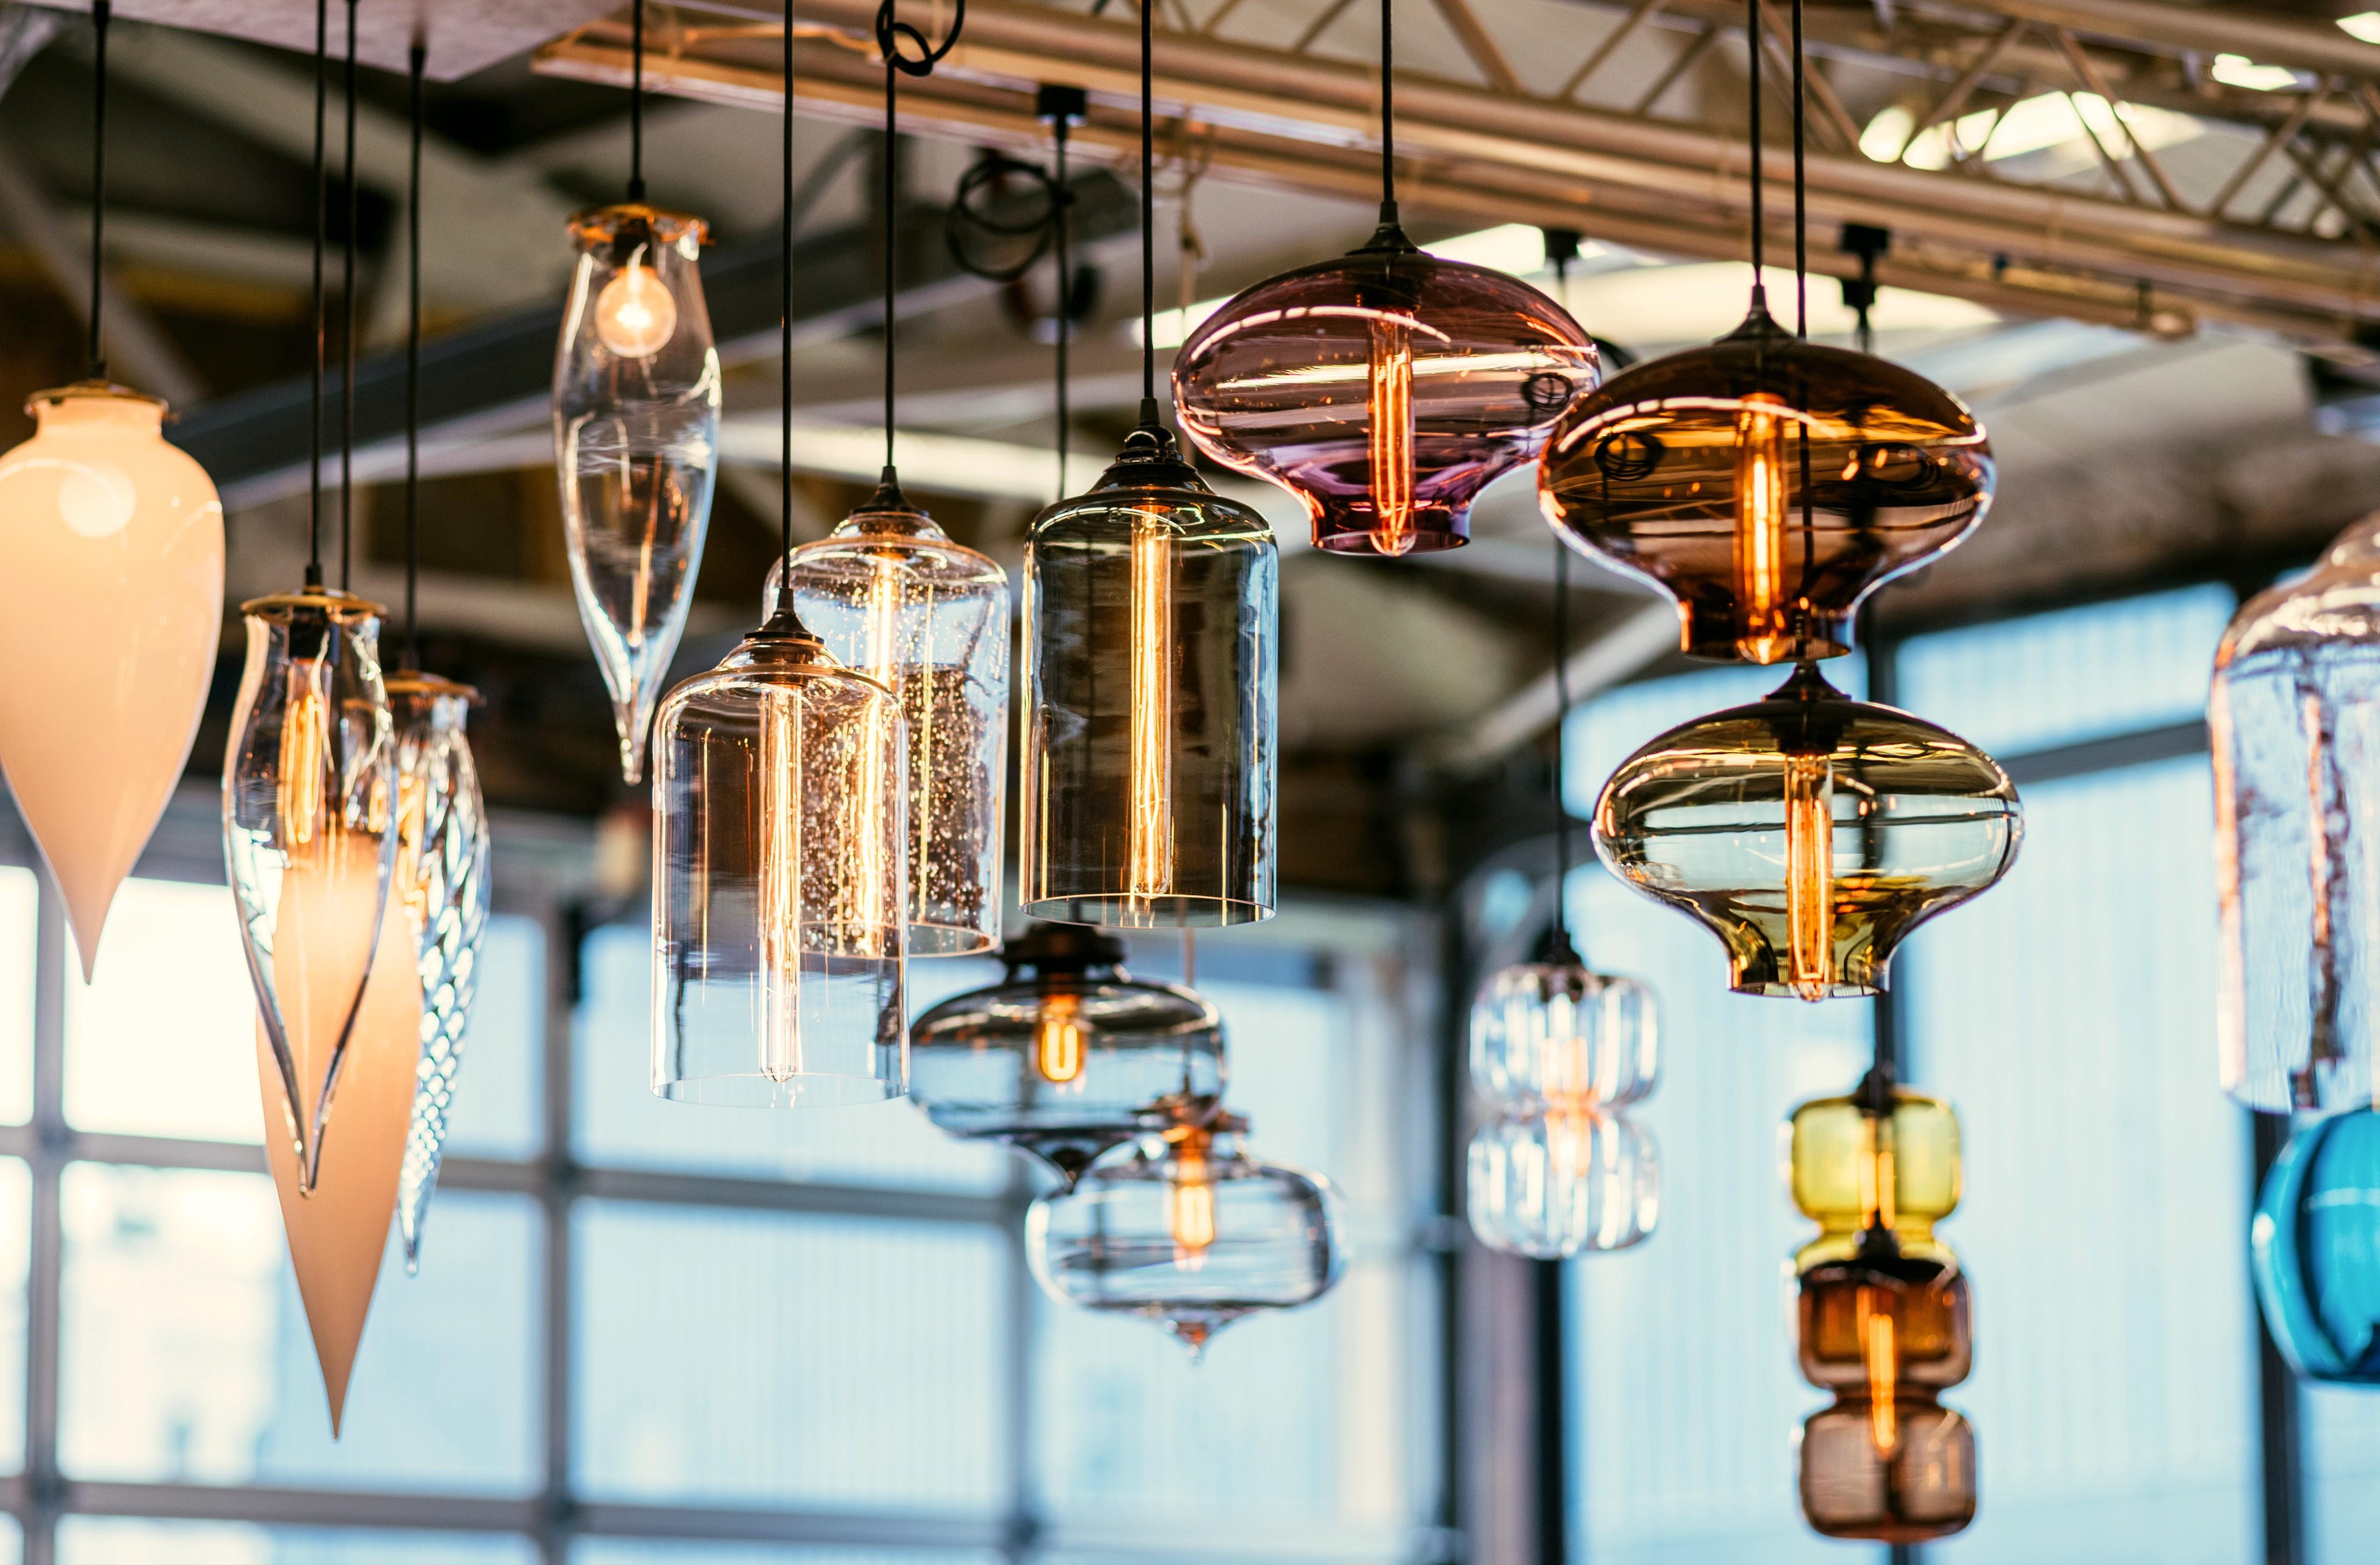 A Bright Idea Niche S Spring Factory Lighting Sponsored Design Decor Hudson Valley Chronogram